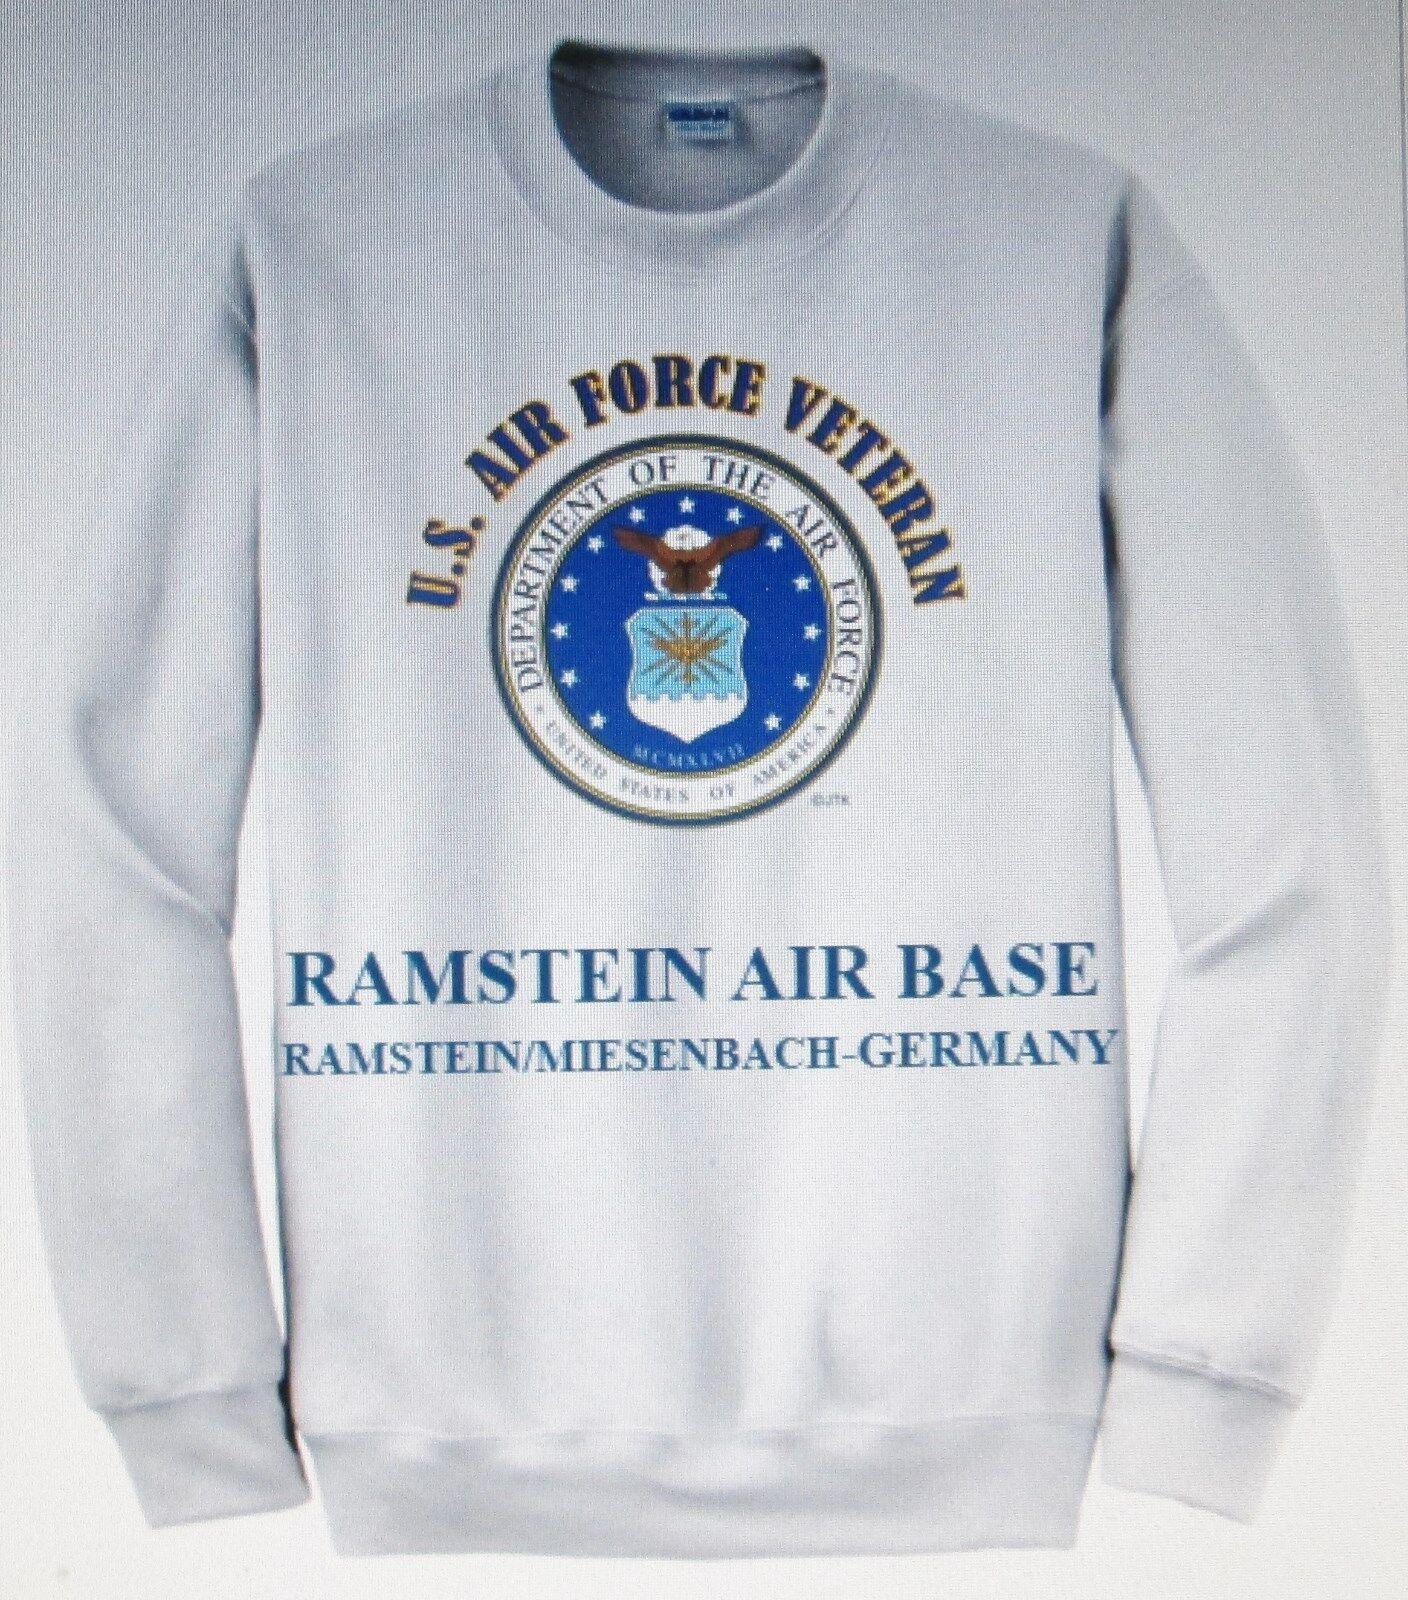 RAMSTEIN AIR BASERAMSTEIN/MIESENBACH-GERMANYU.S. AIR FORCE EMBLEM SWEATSHIRT